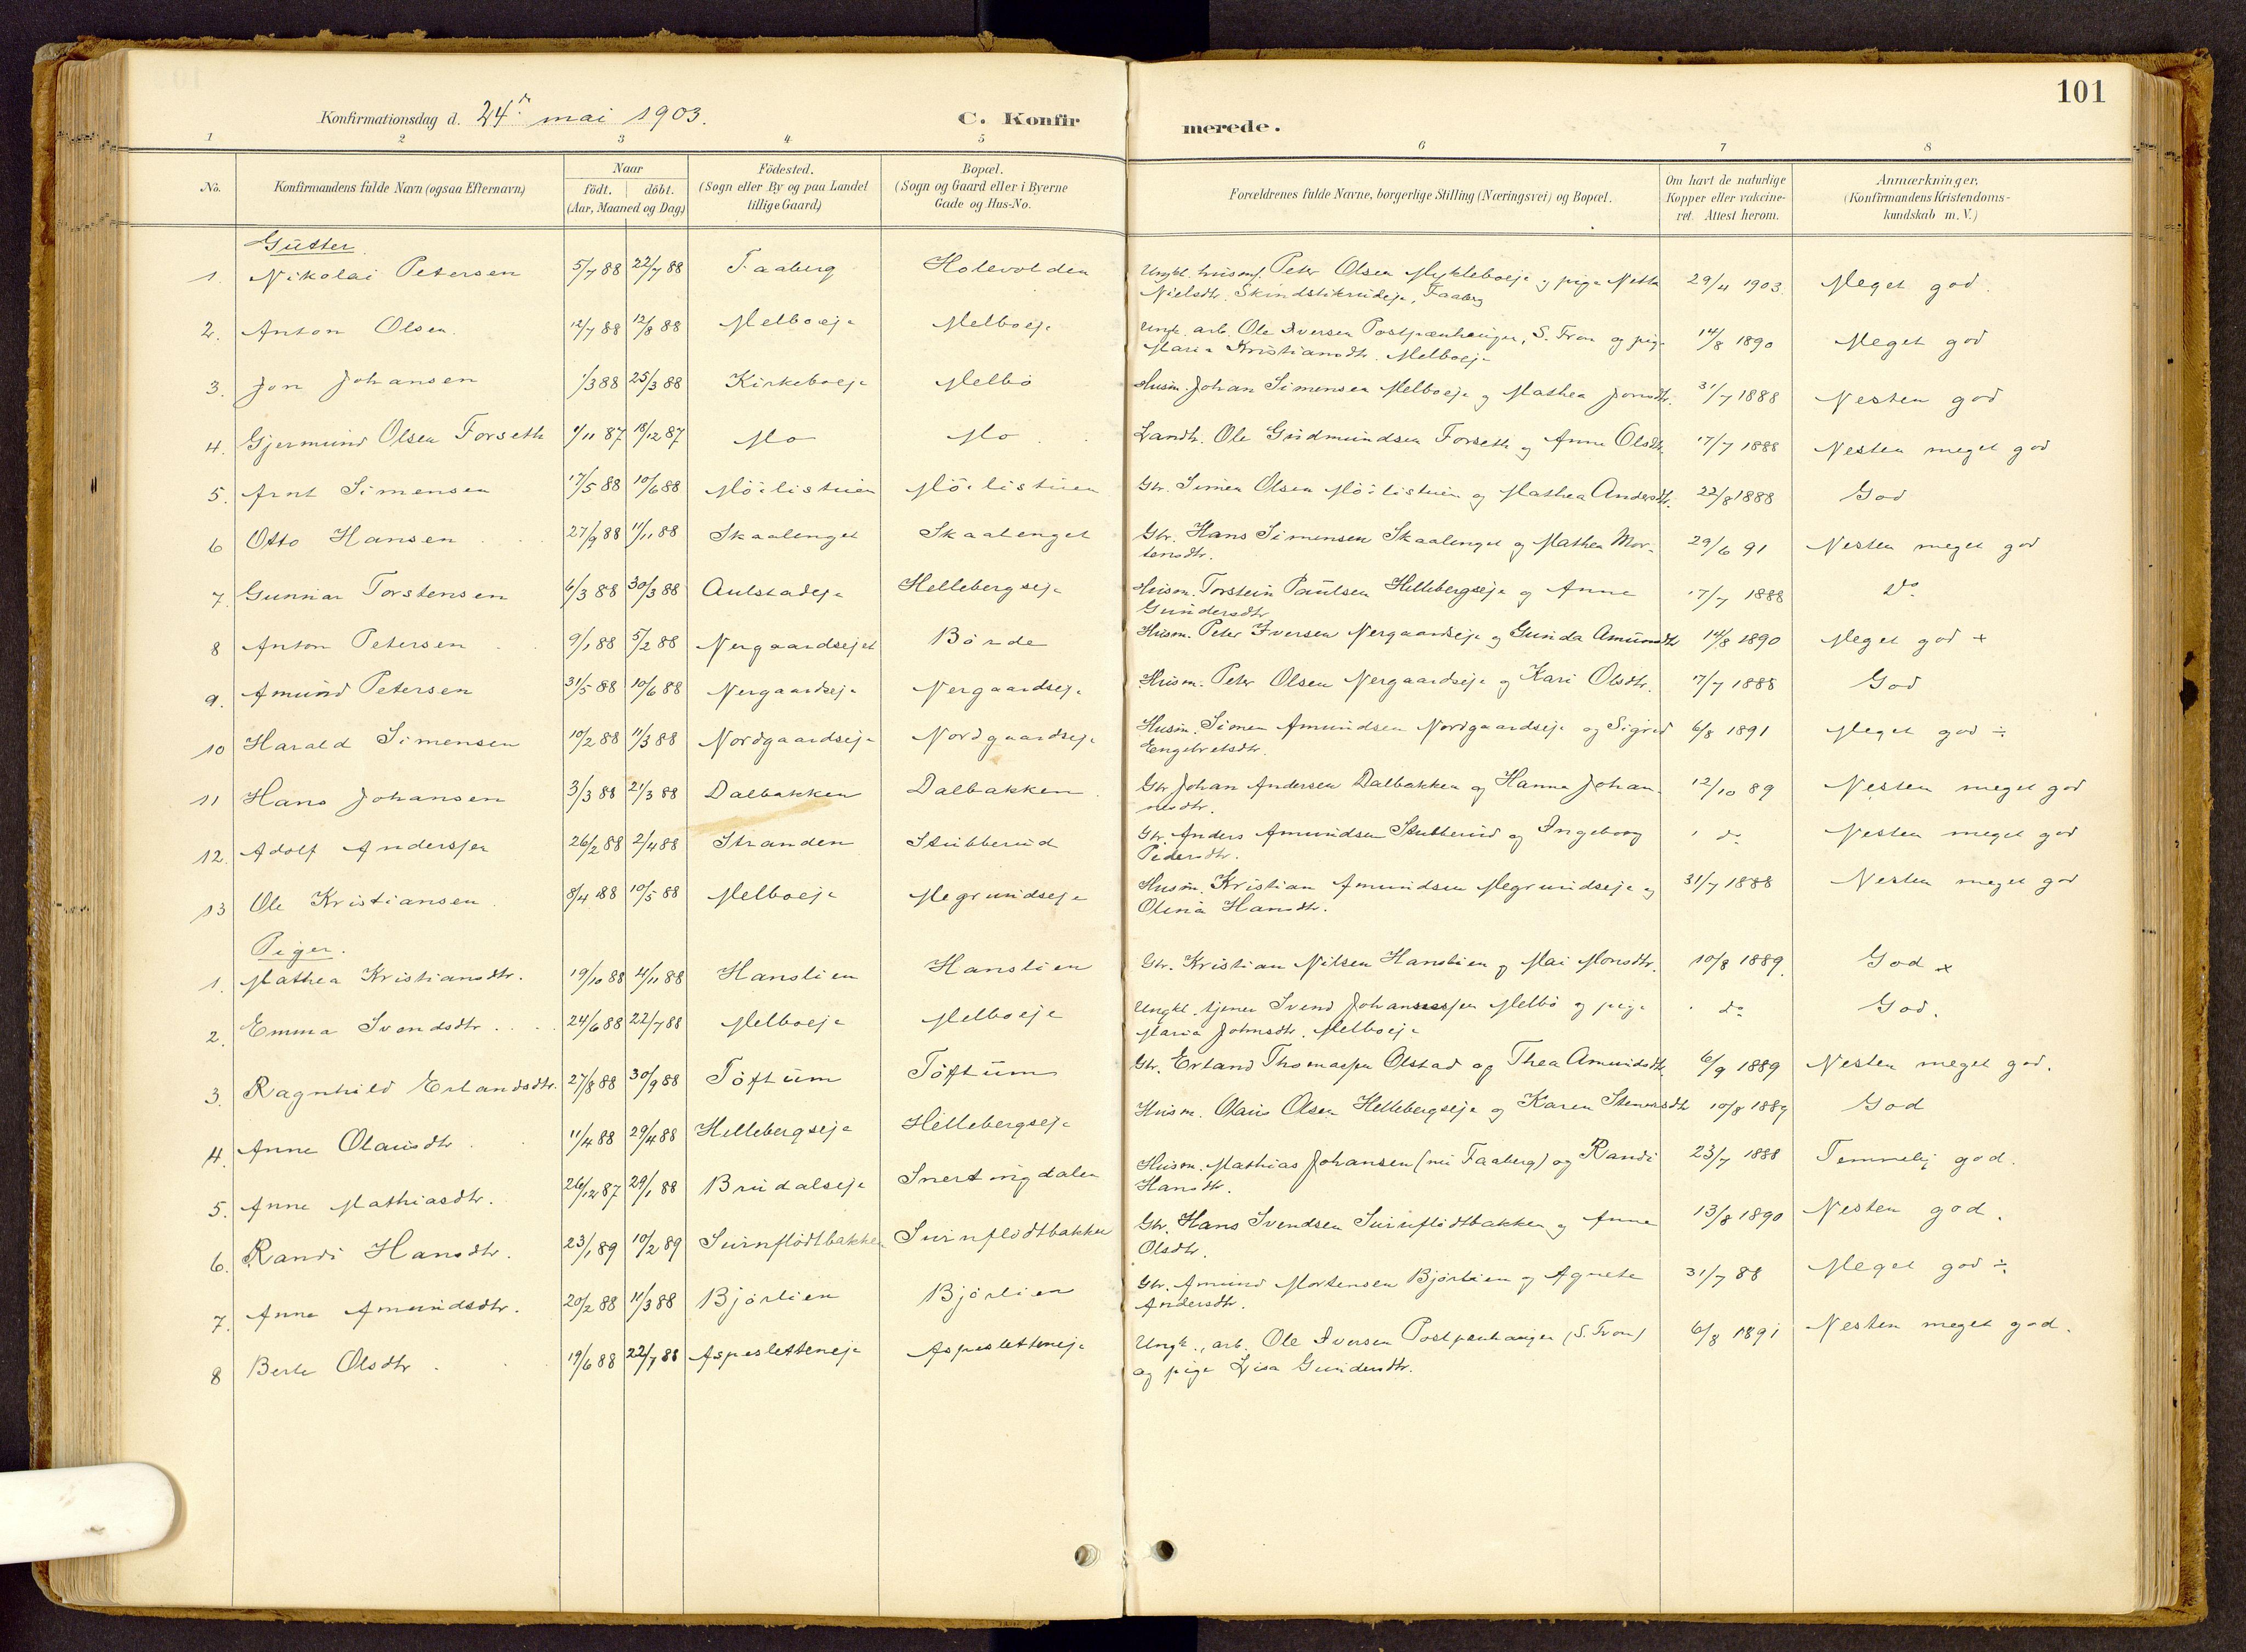 SAH, Vestre Gausdal prestekontor, Ministerialbok nr. 2, 1887-1918, s. 101